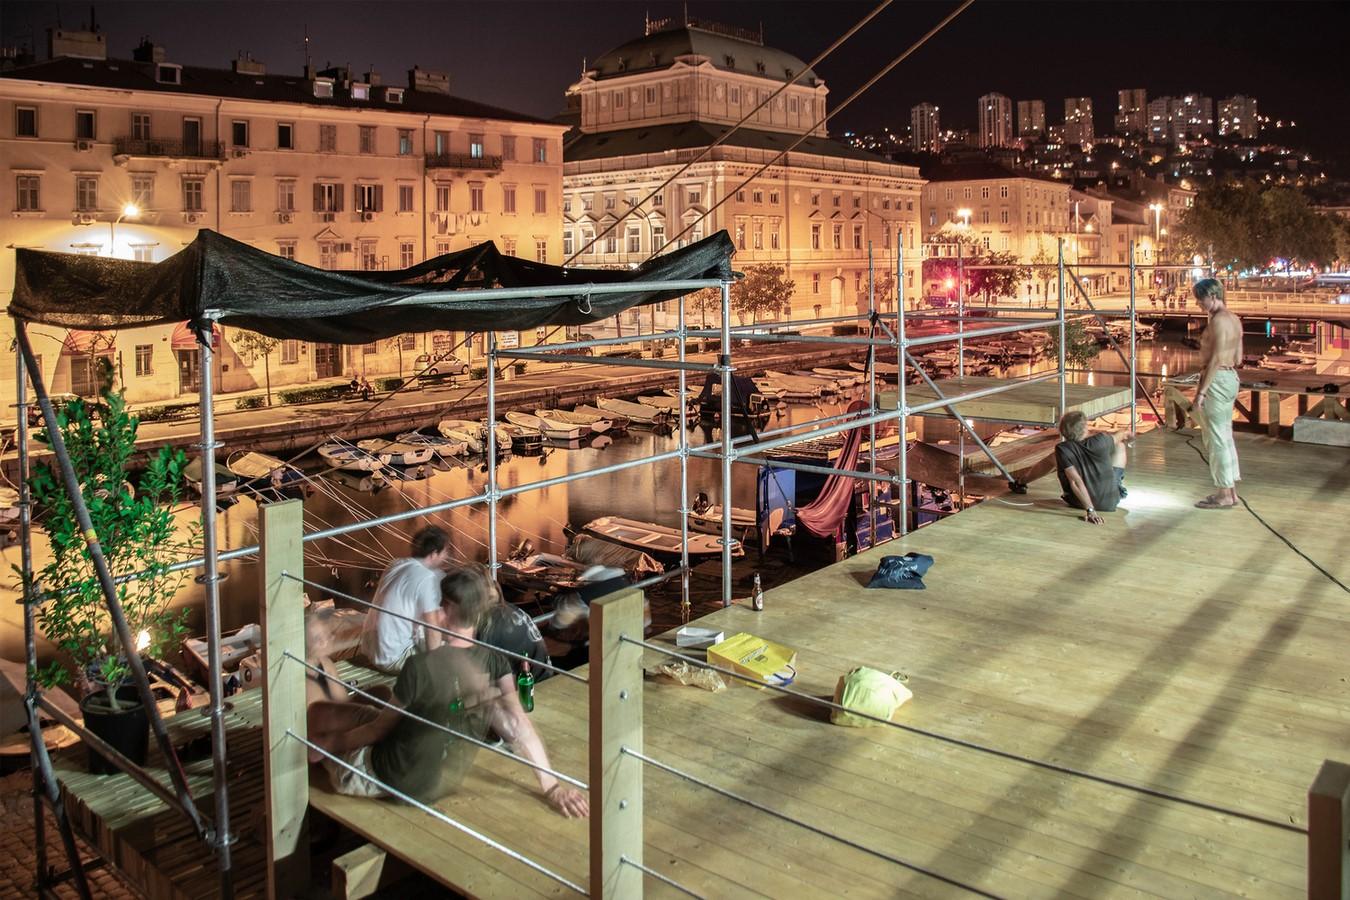 Urban regeneration through public space - Sheet14